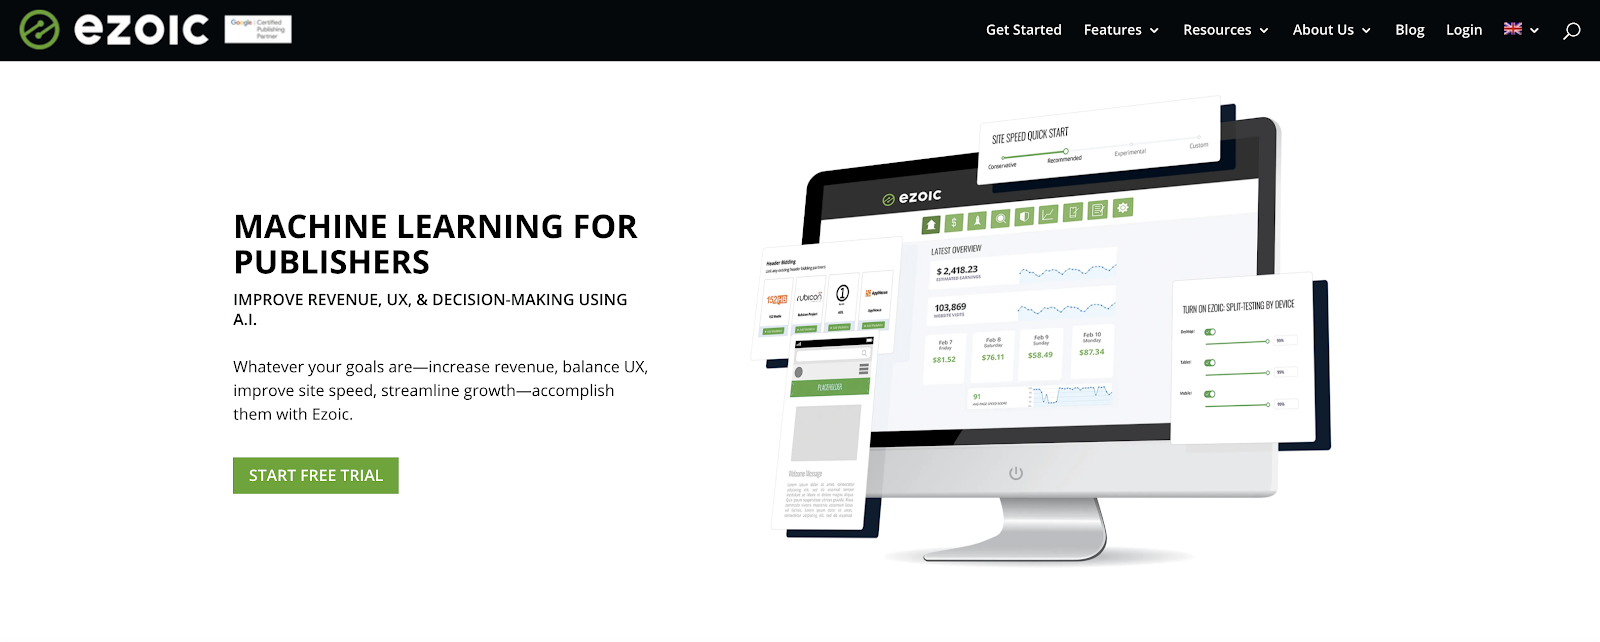 Ezoic Homepage Screenshot (to Display Blog Advertisements)